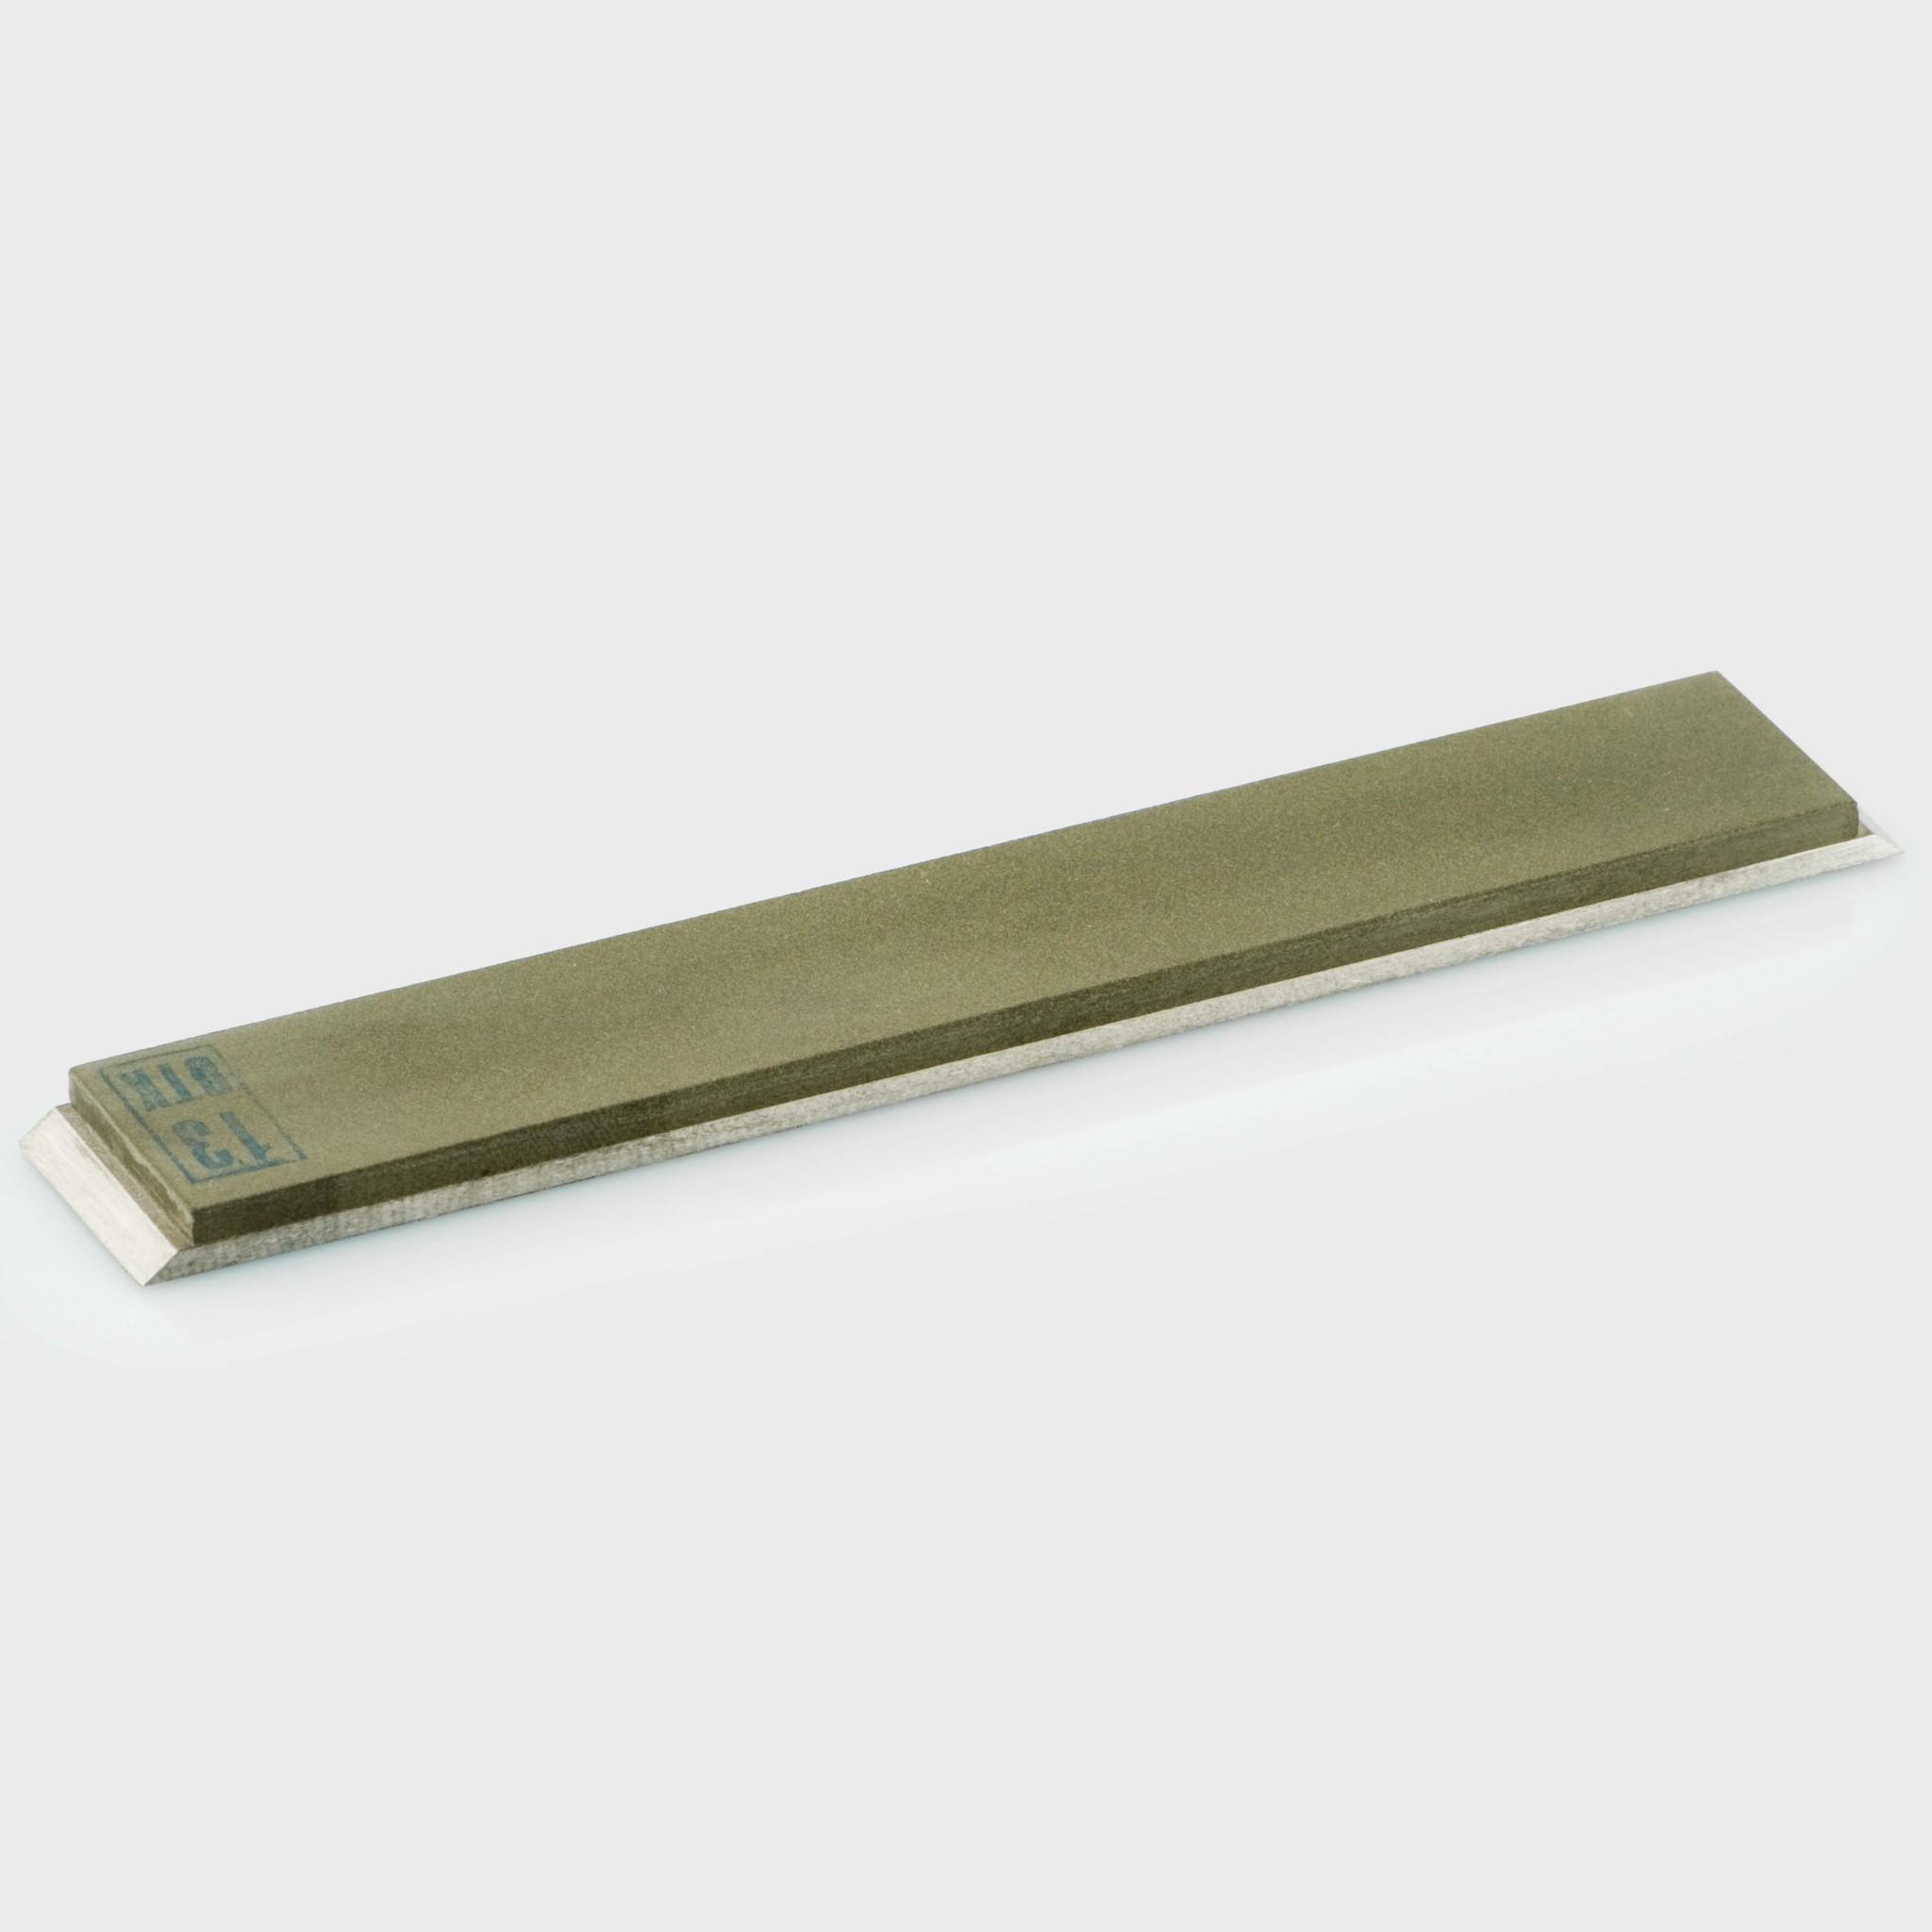 150х25х6 мм для Apex Edge Pro, ЖУК Алмазный брусок 150х25х6 200/160 25% IMGP2750_copy.jpg